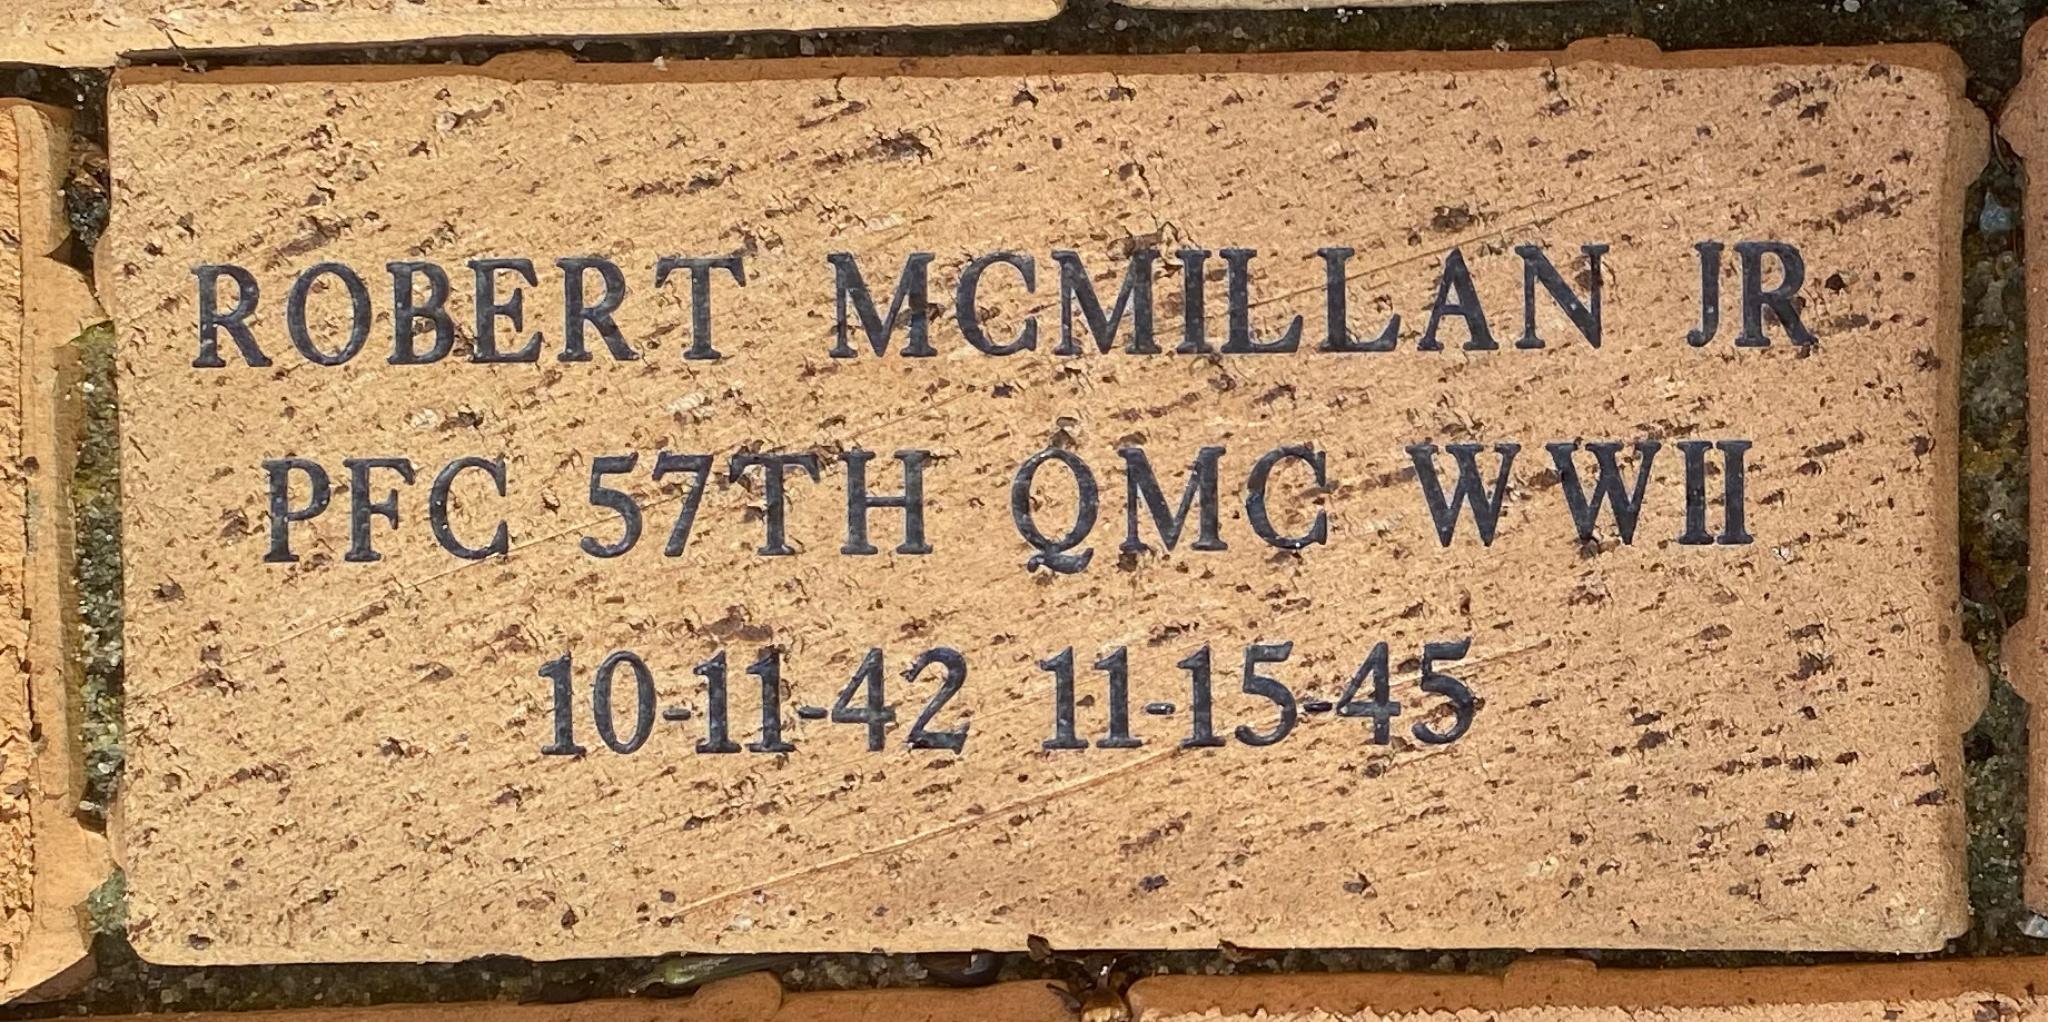 ROBERT MCMILLAN JR PFC 57TH QMC WWII 10-11-42 – 11-15-45